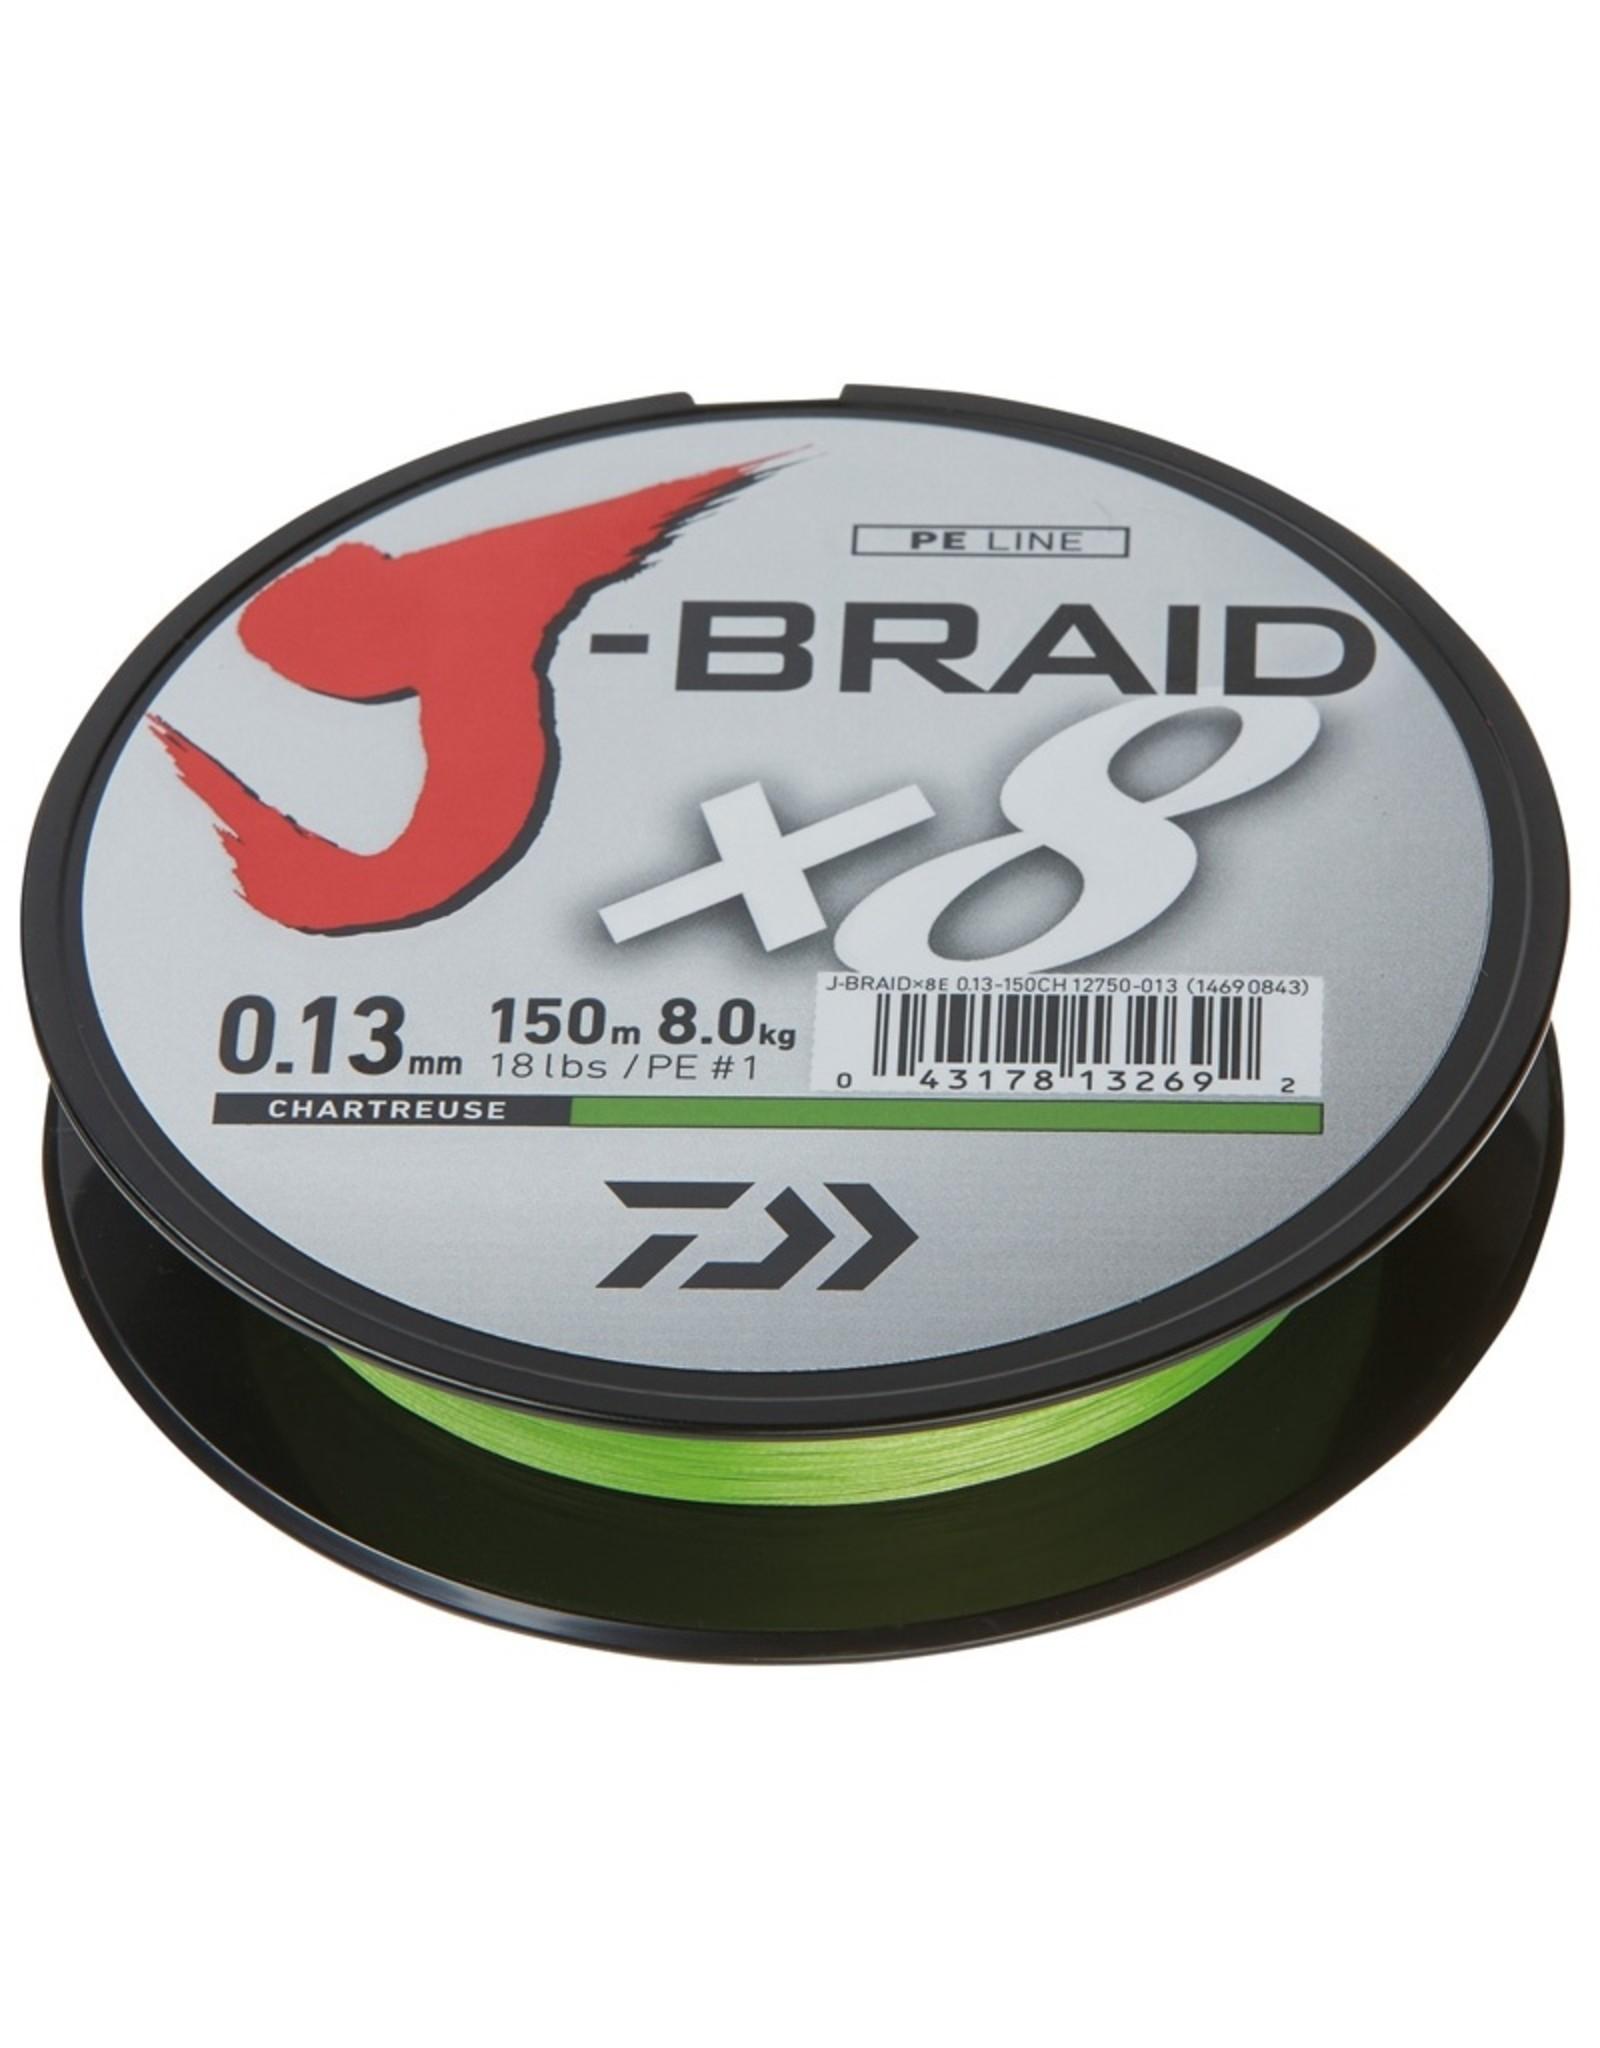 Daiwa Daiwa J Braid X8 150m Chartreuse